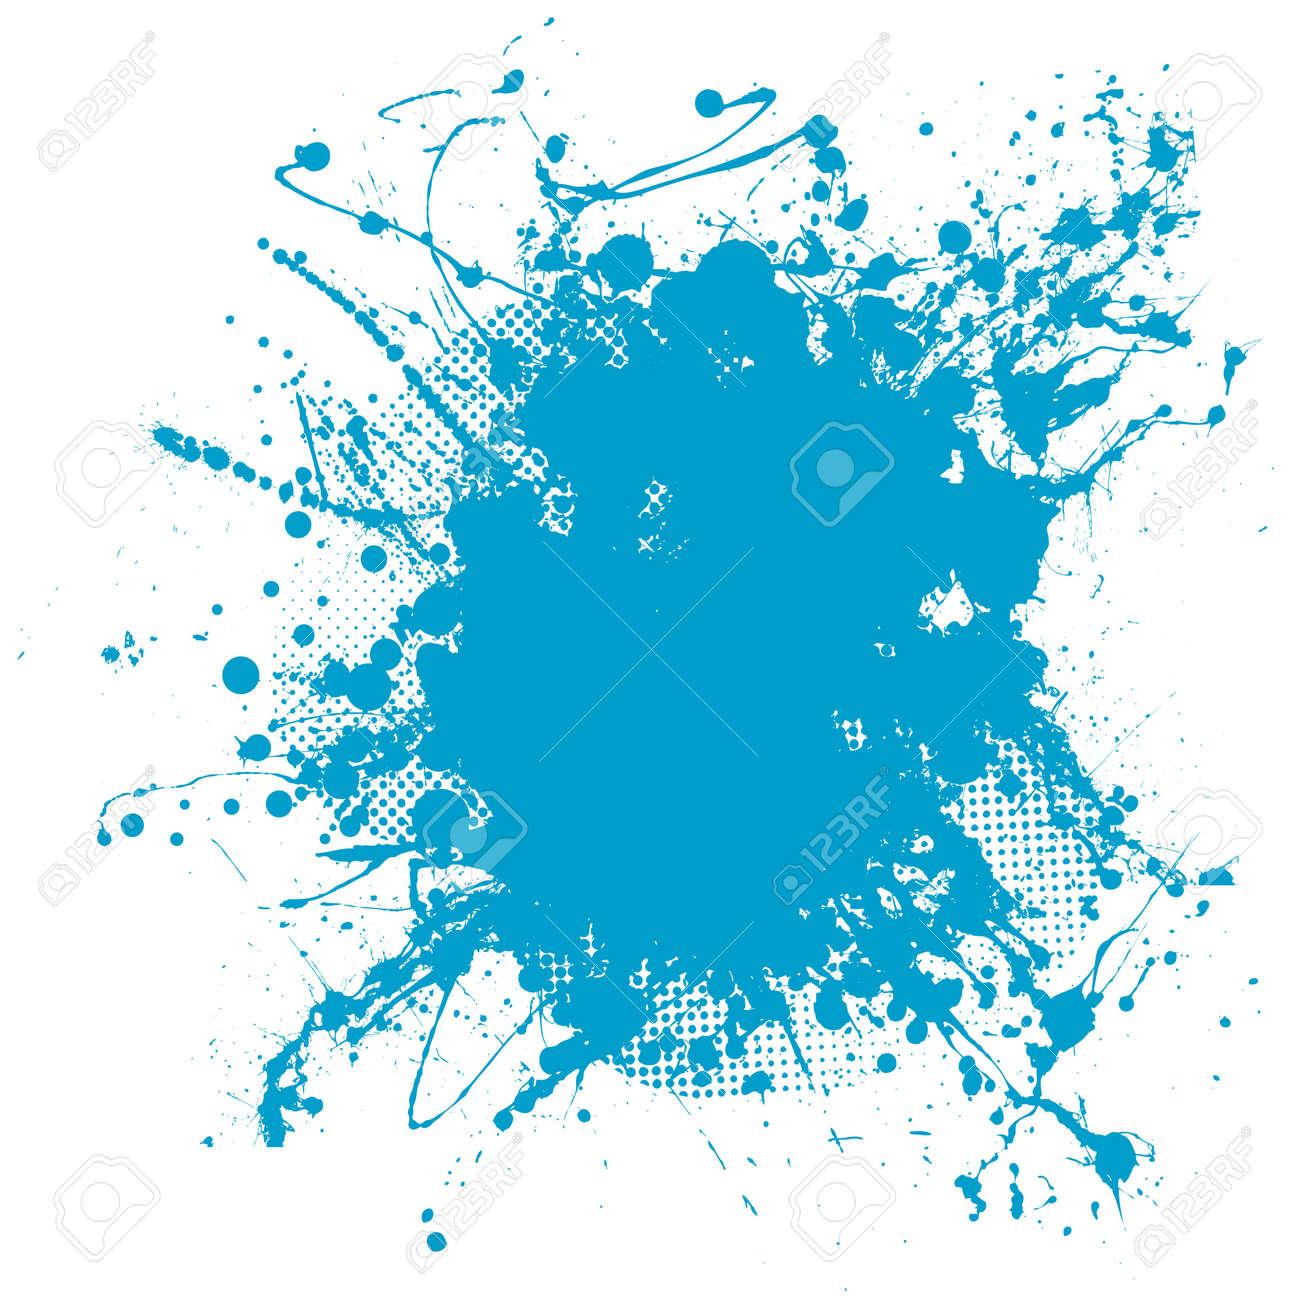 Grunge ink splat background blob with halftone dots - 9413890